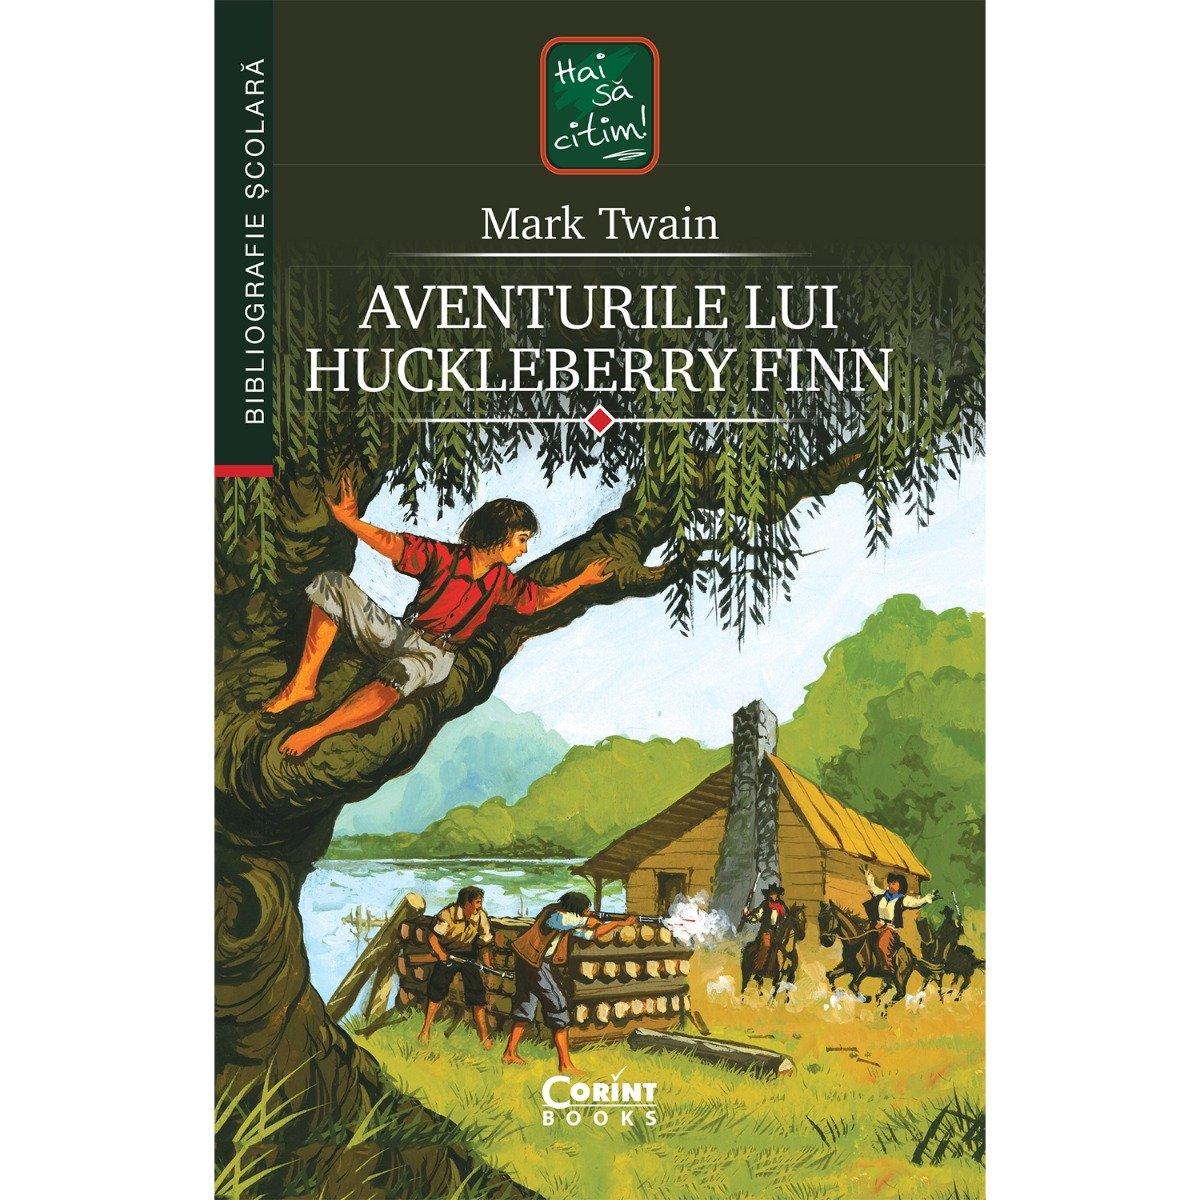 Carte Editura Corint, Aventurile lui Huckleberry Finn, Mark Twain